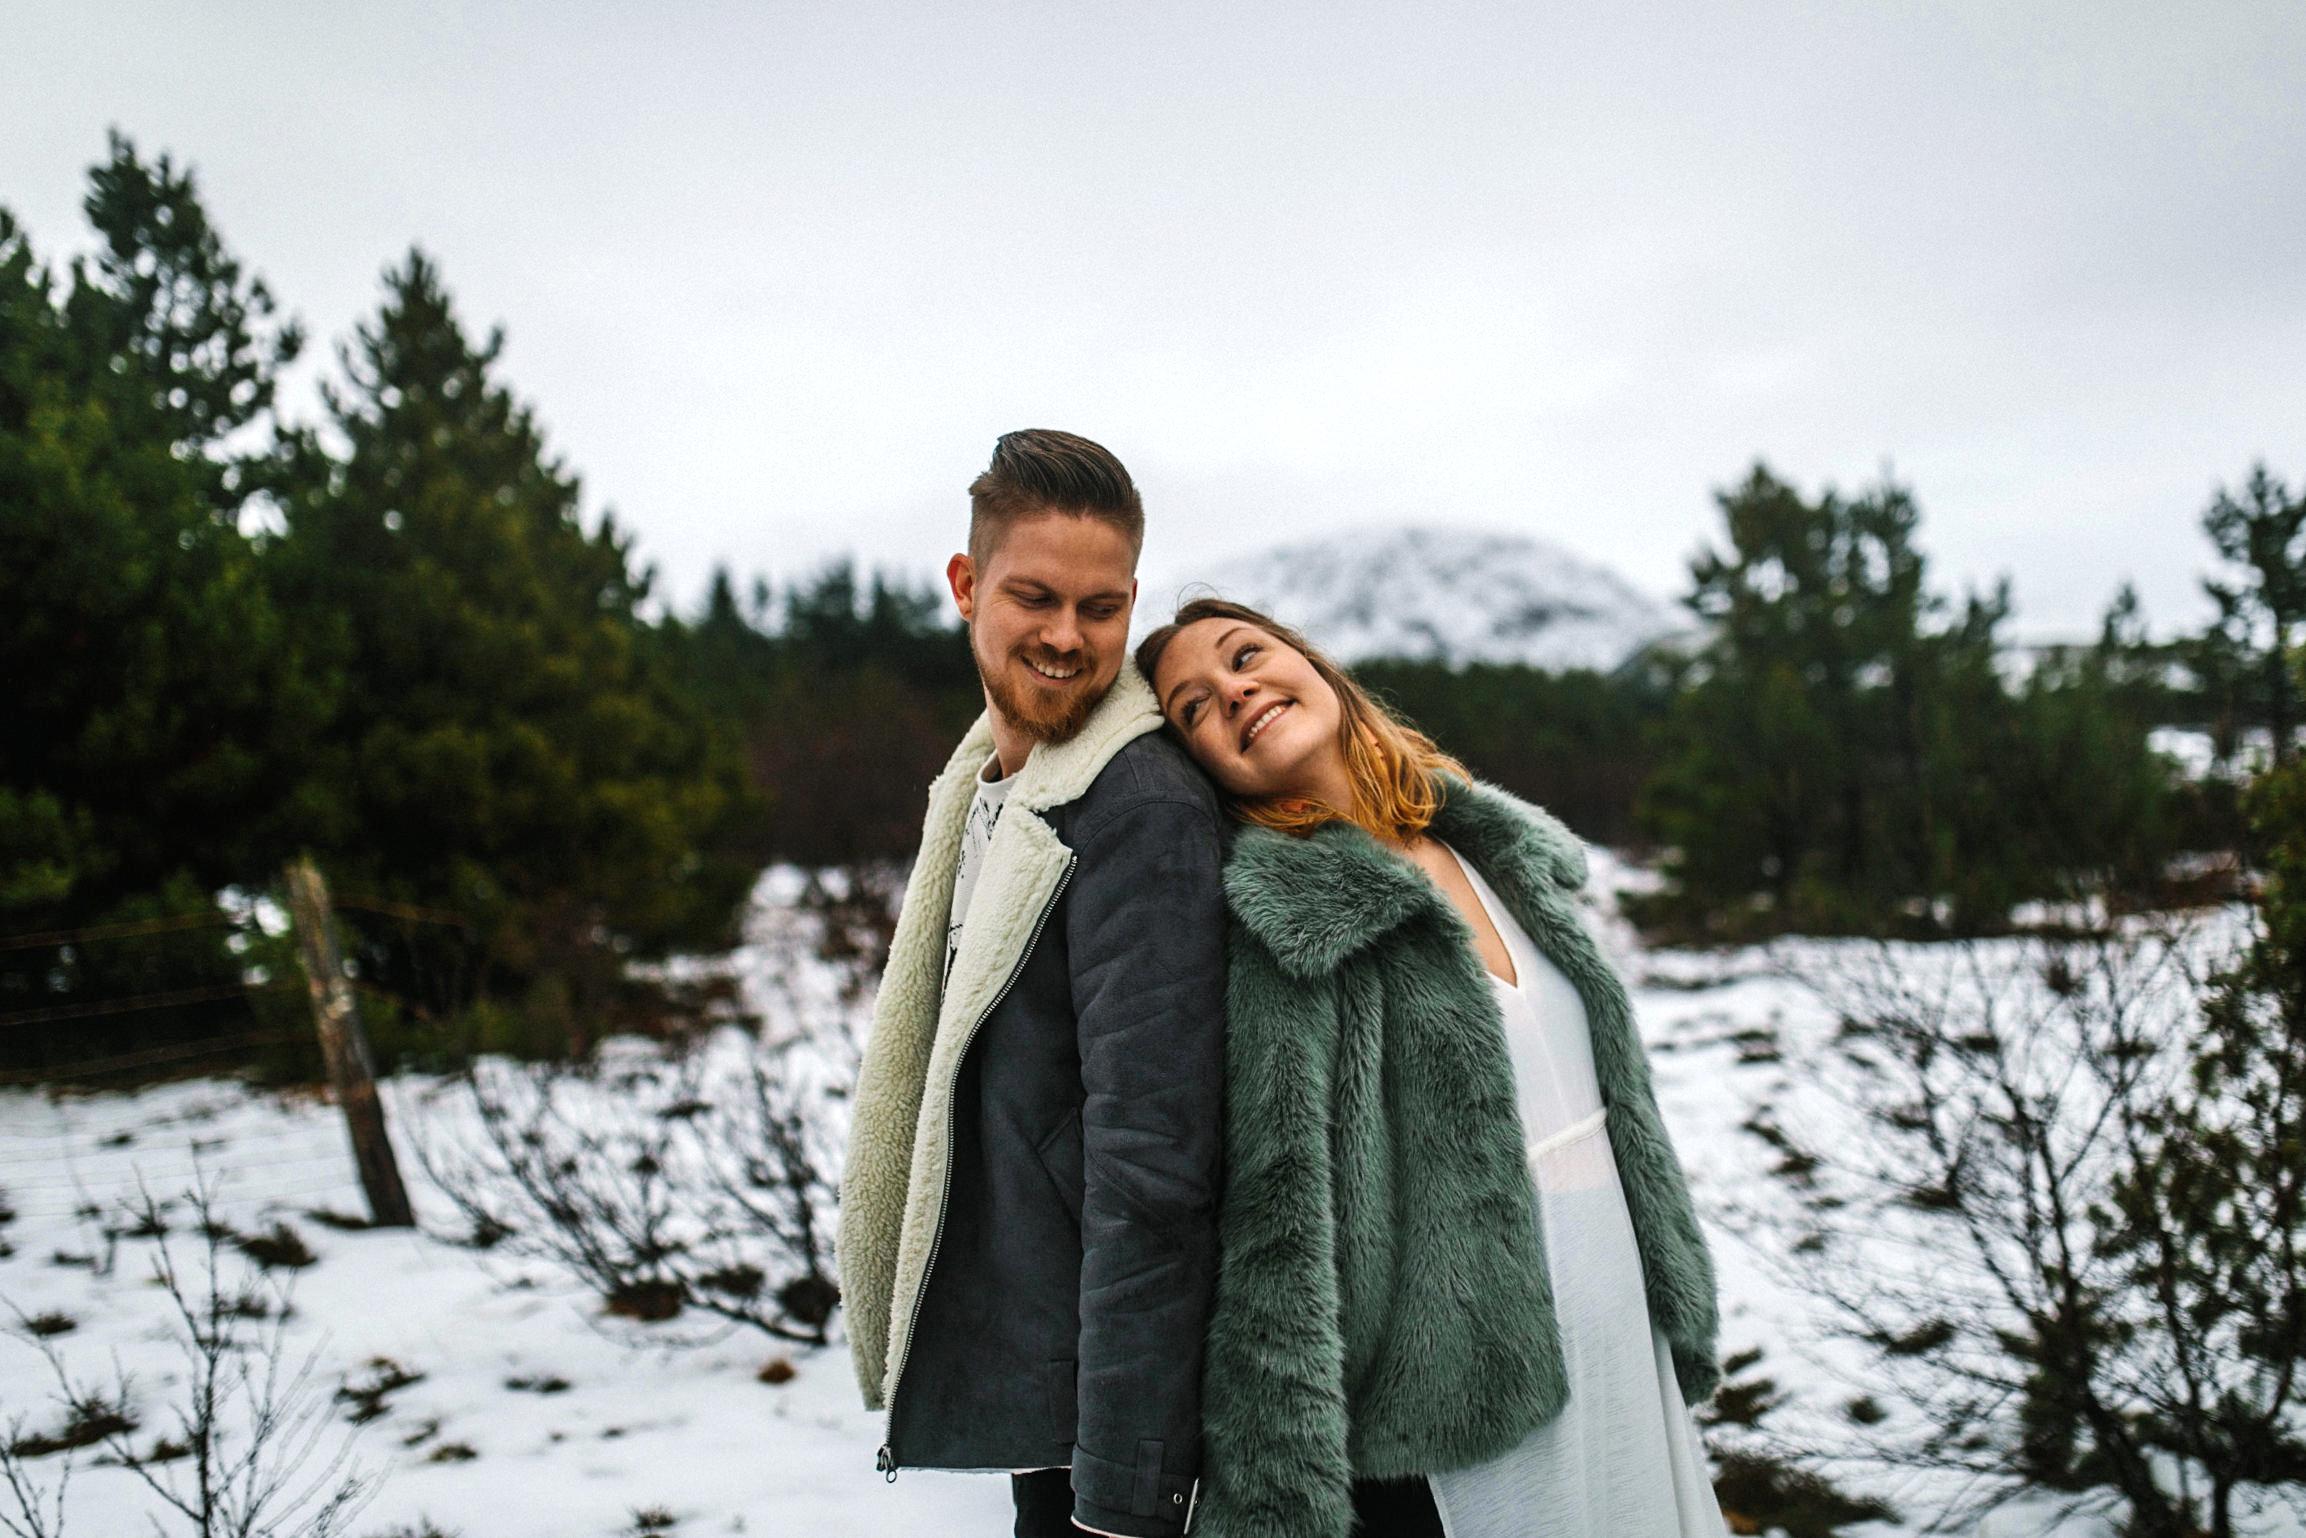 just-us-2-1 Dagbjört & Aron (Just us) // Iceland Engagement Photographer